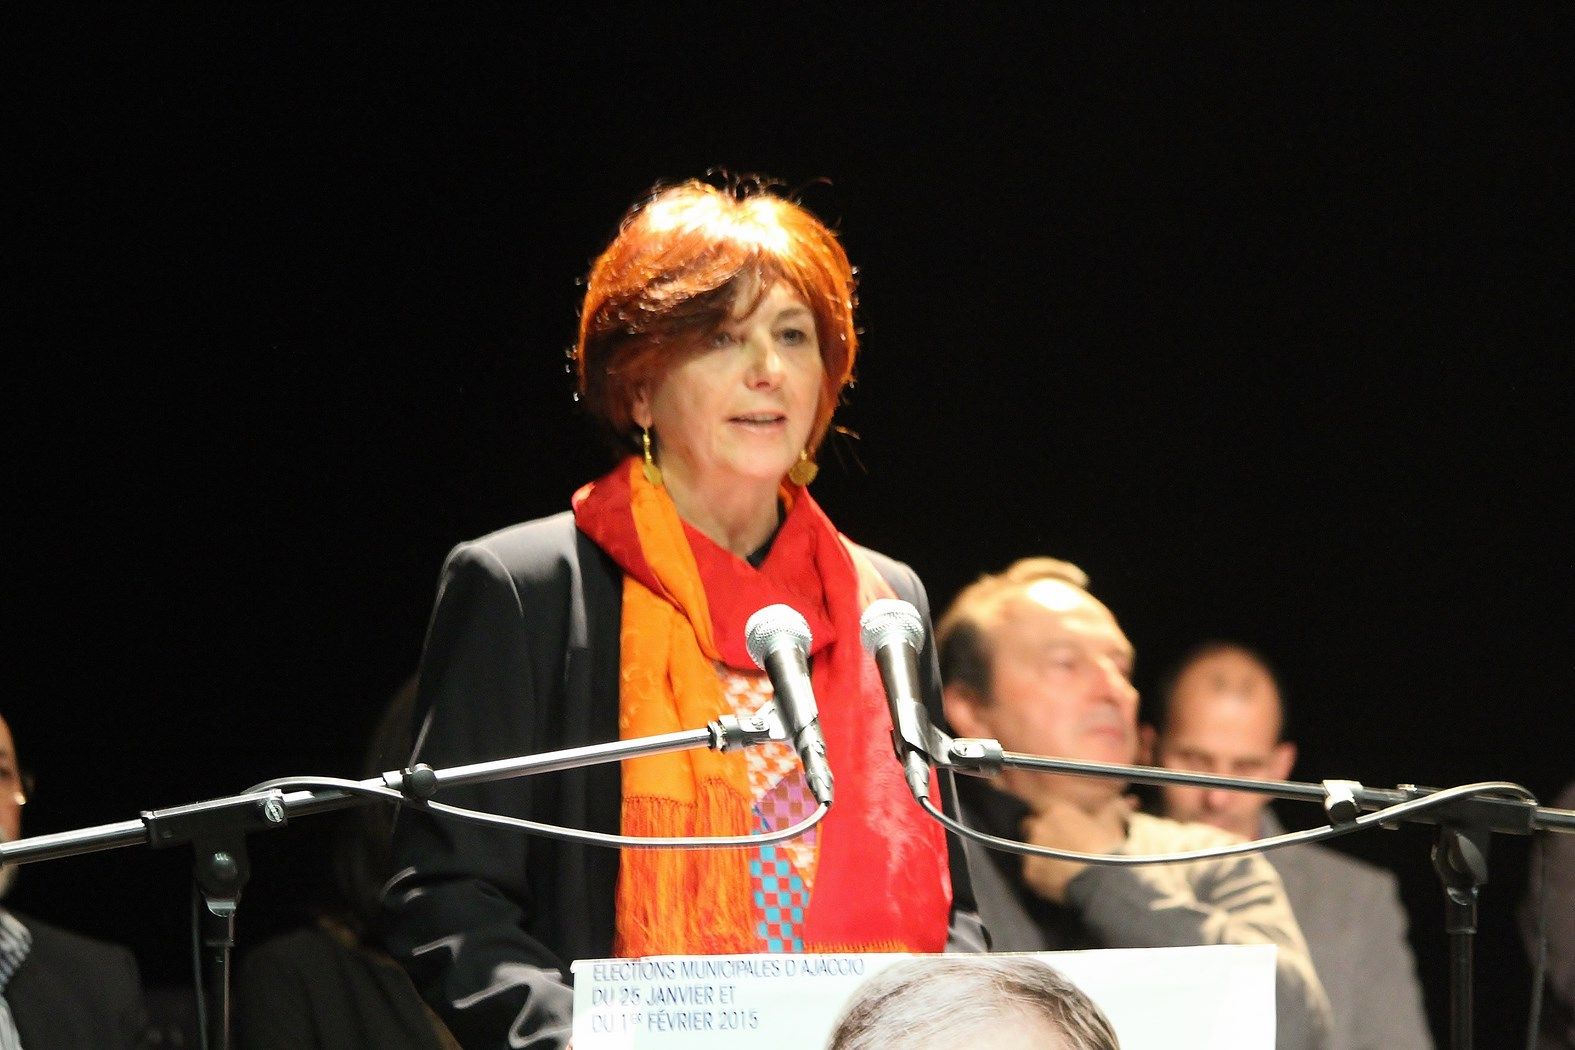 Ajaccio : L'appel des colistiers de Simon Renucci